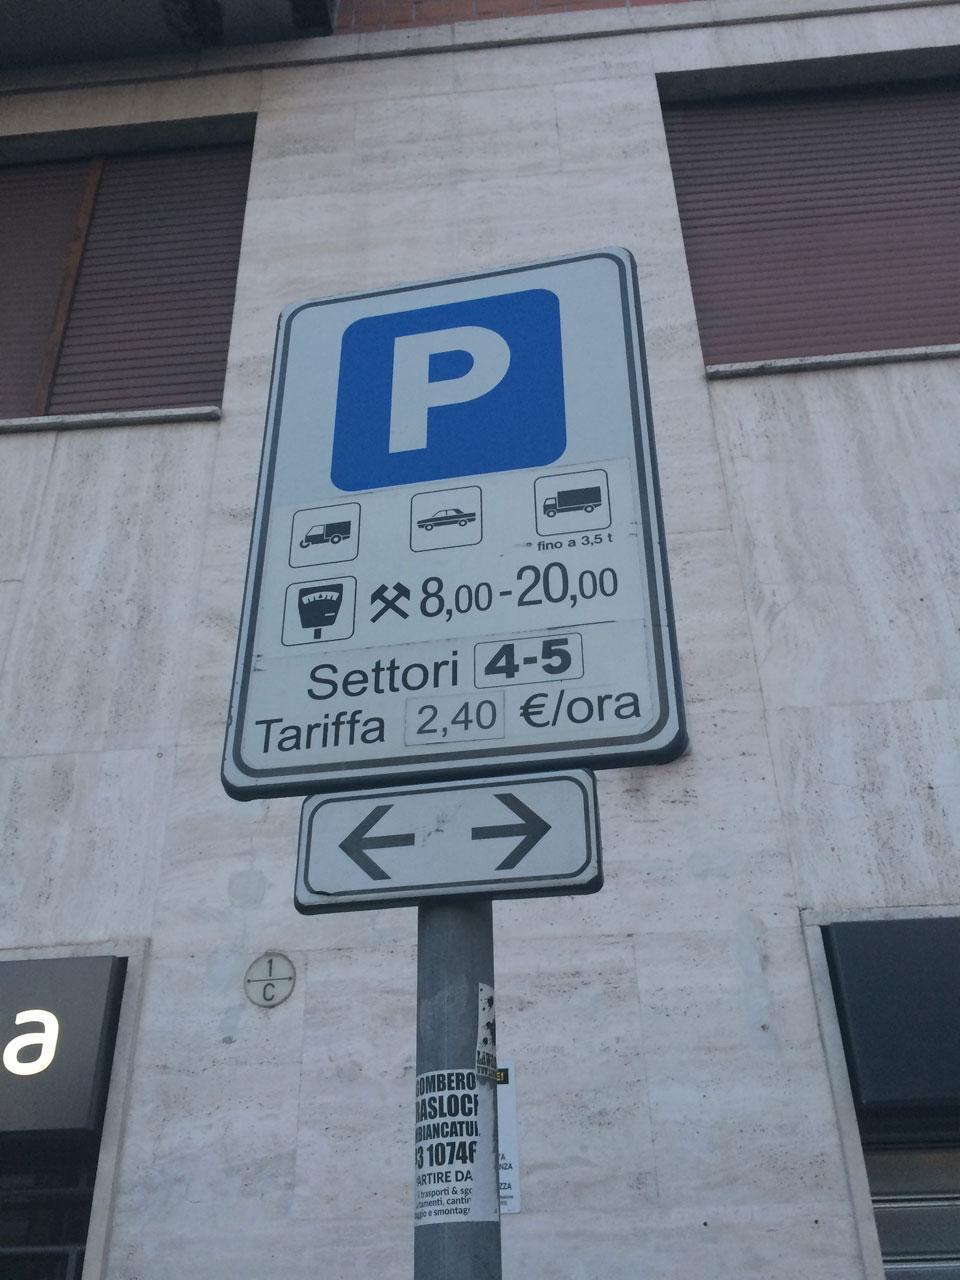 Знак парковки с ограничениями и указаниями